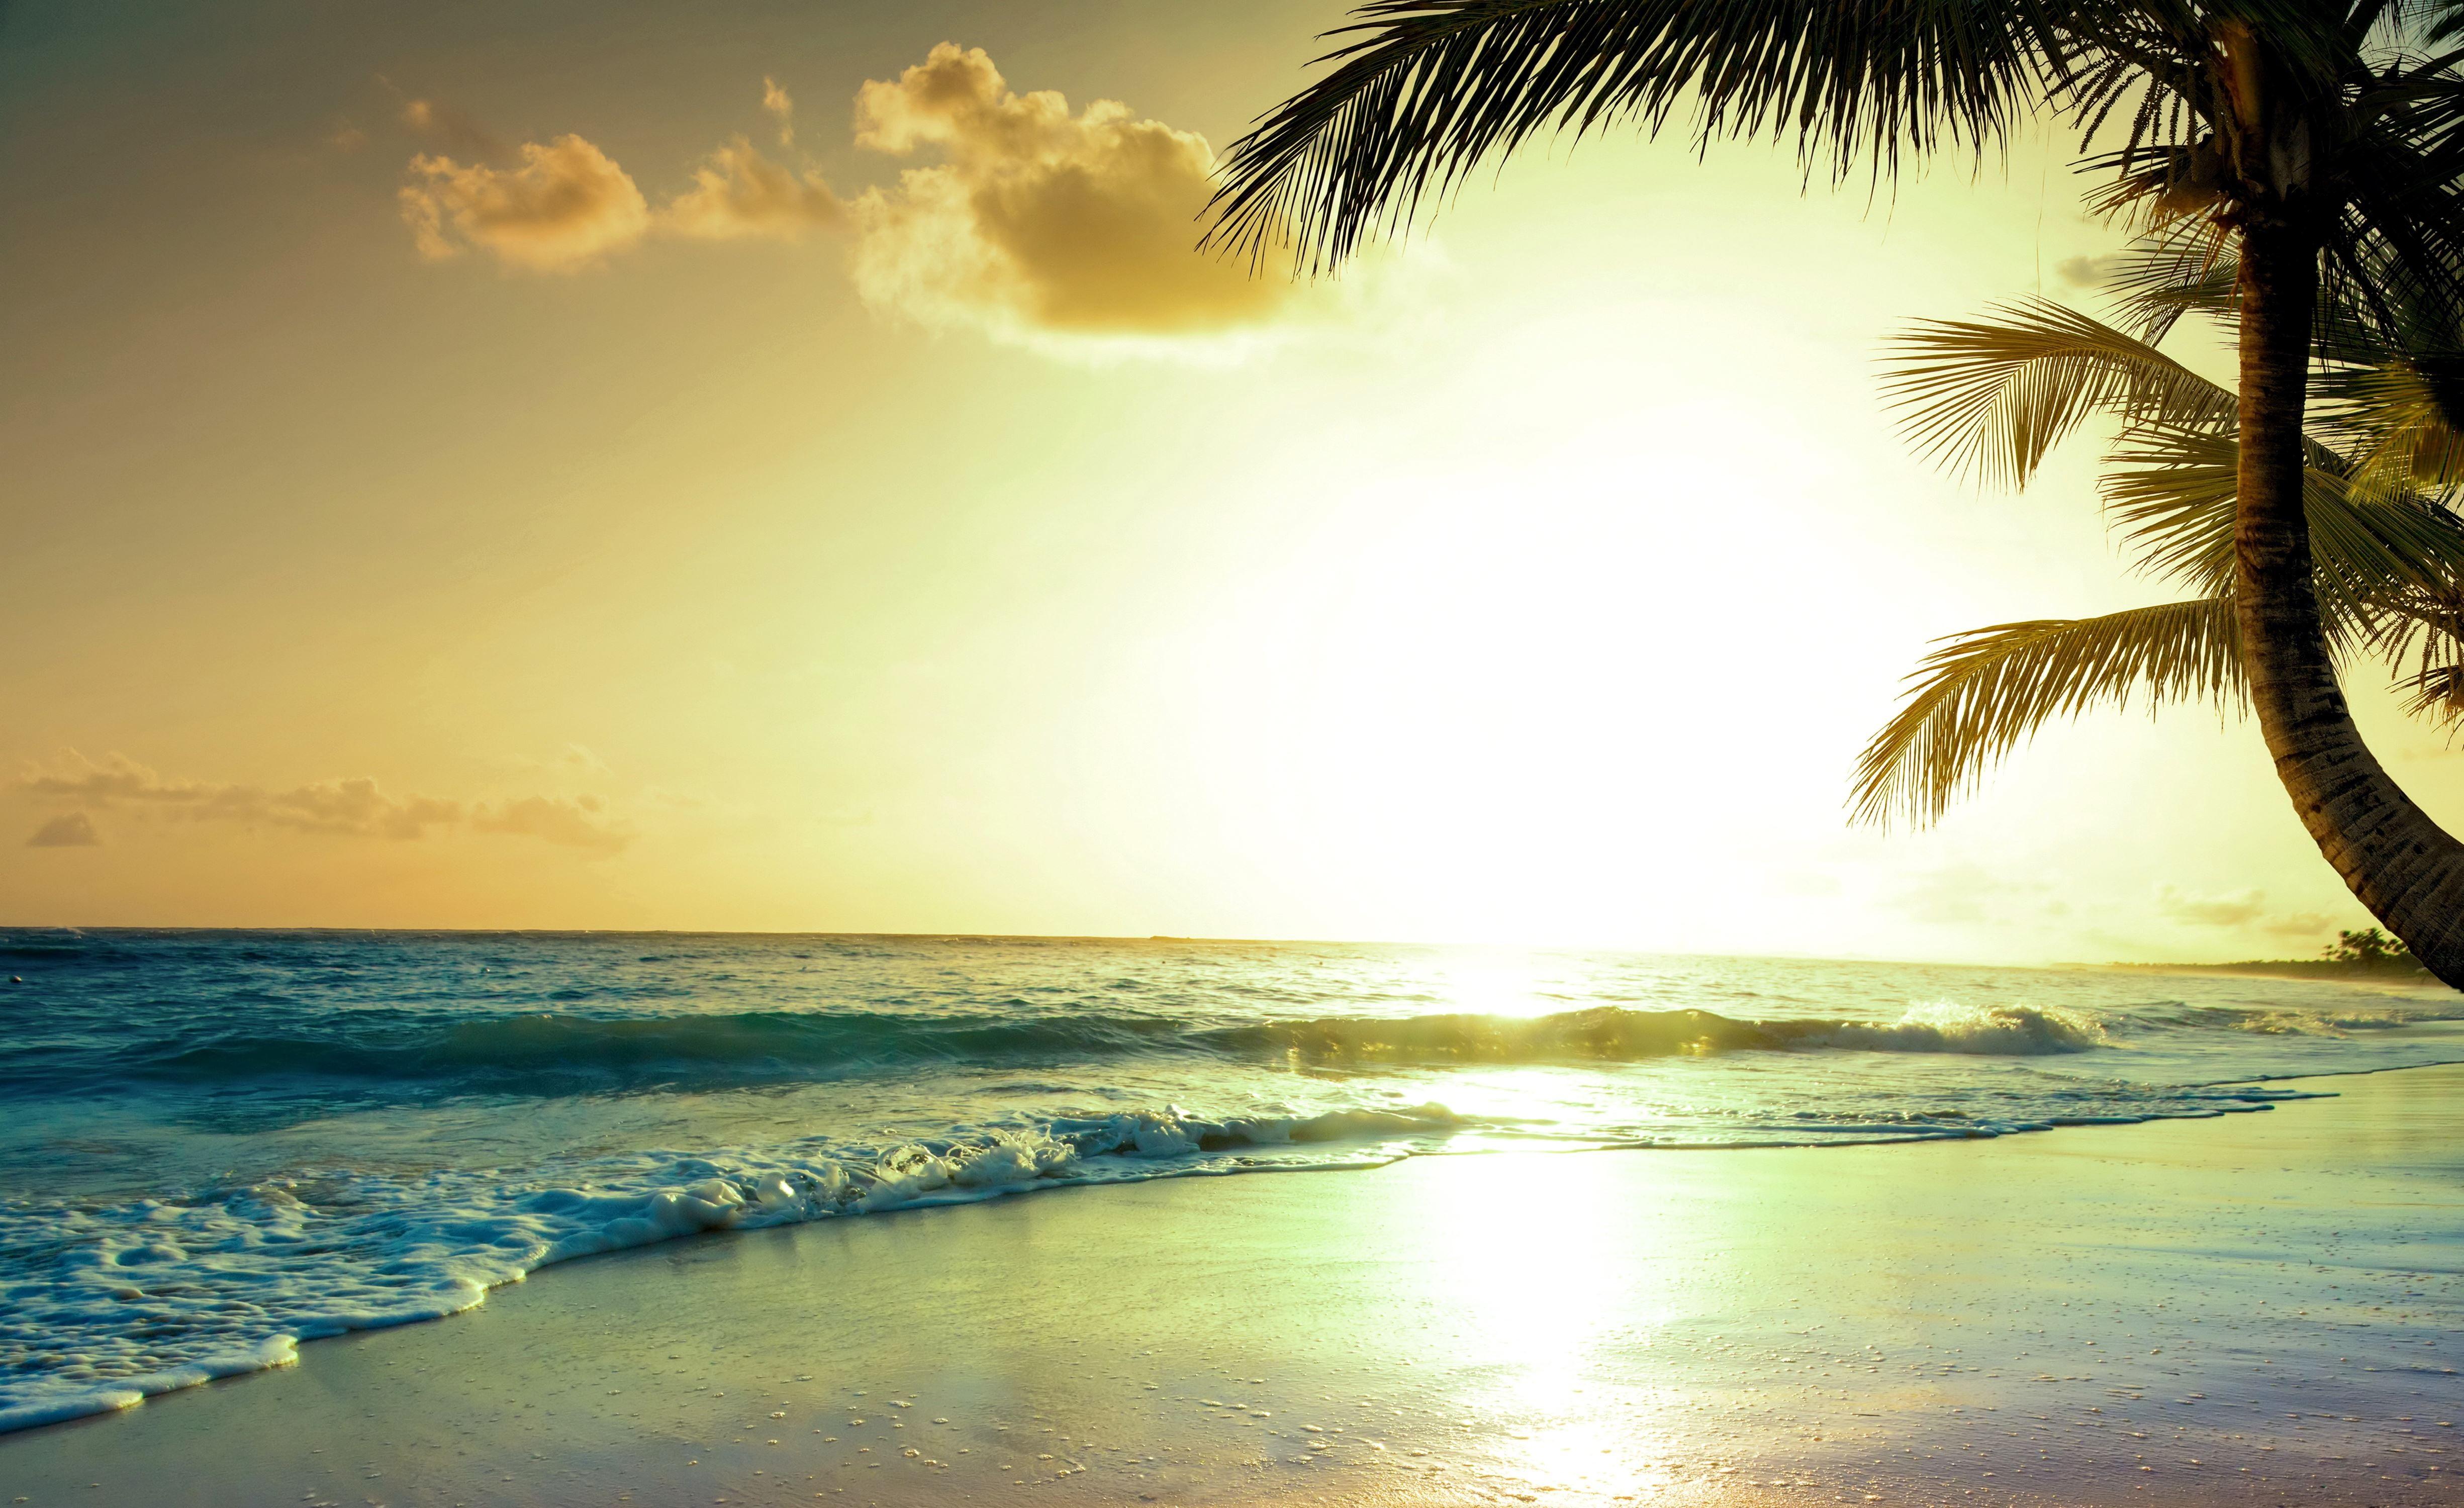 Wallpaper Tropical Beach 5k 4k Wallpaper Paradise